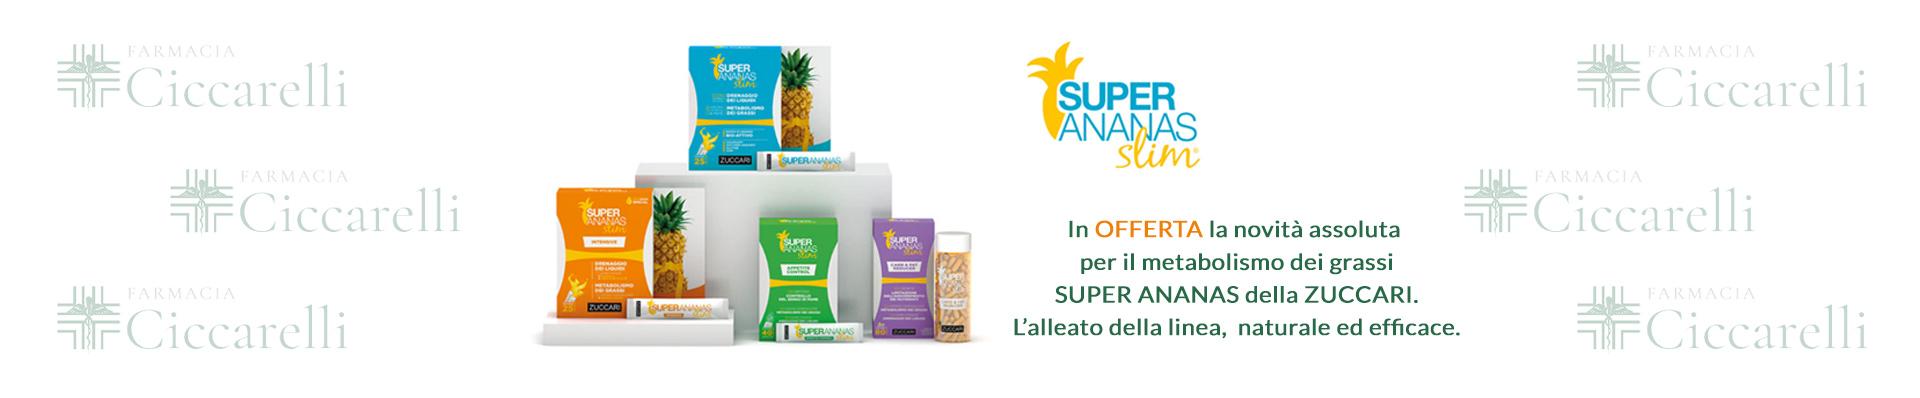 Super Ananas Slim Zuccari